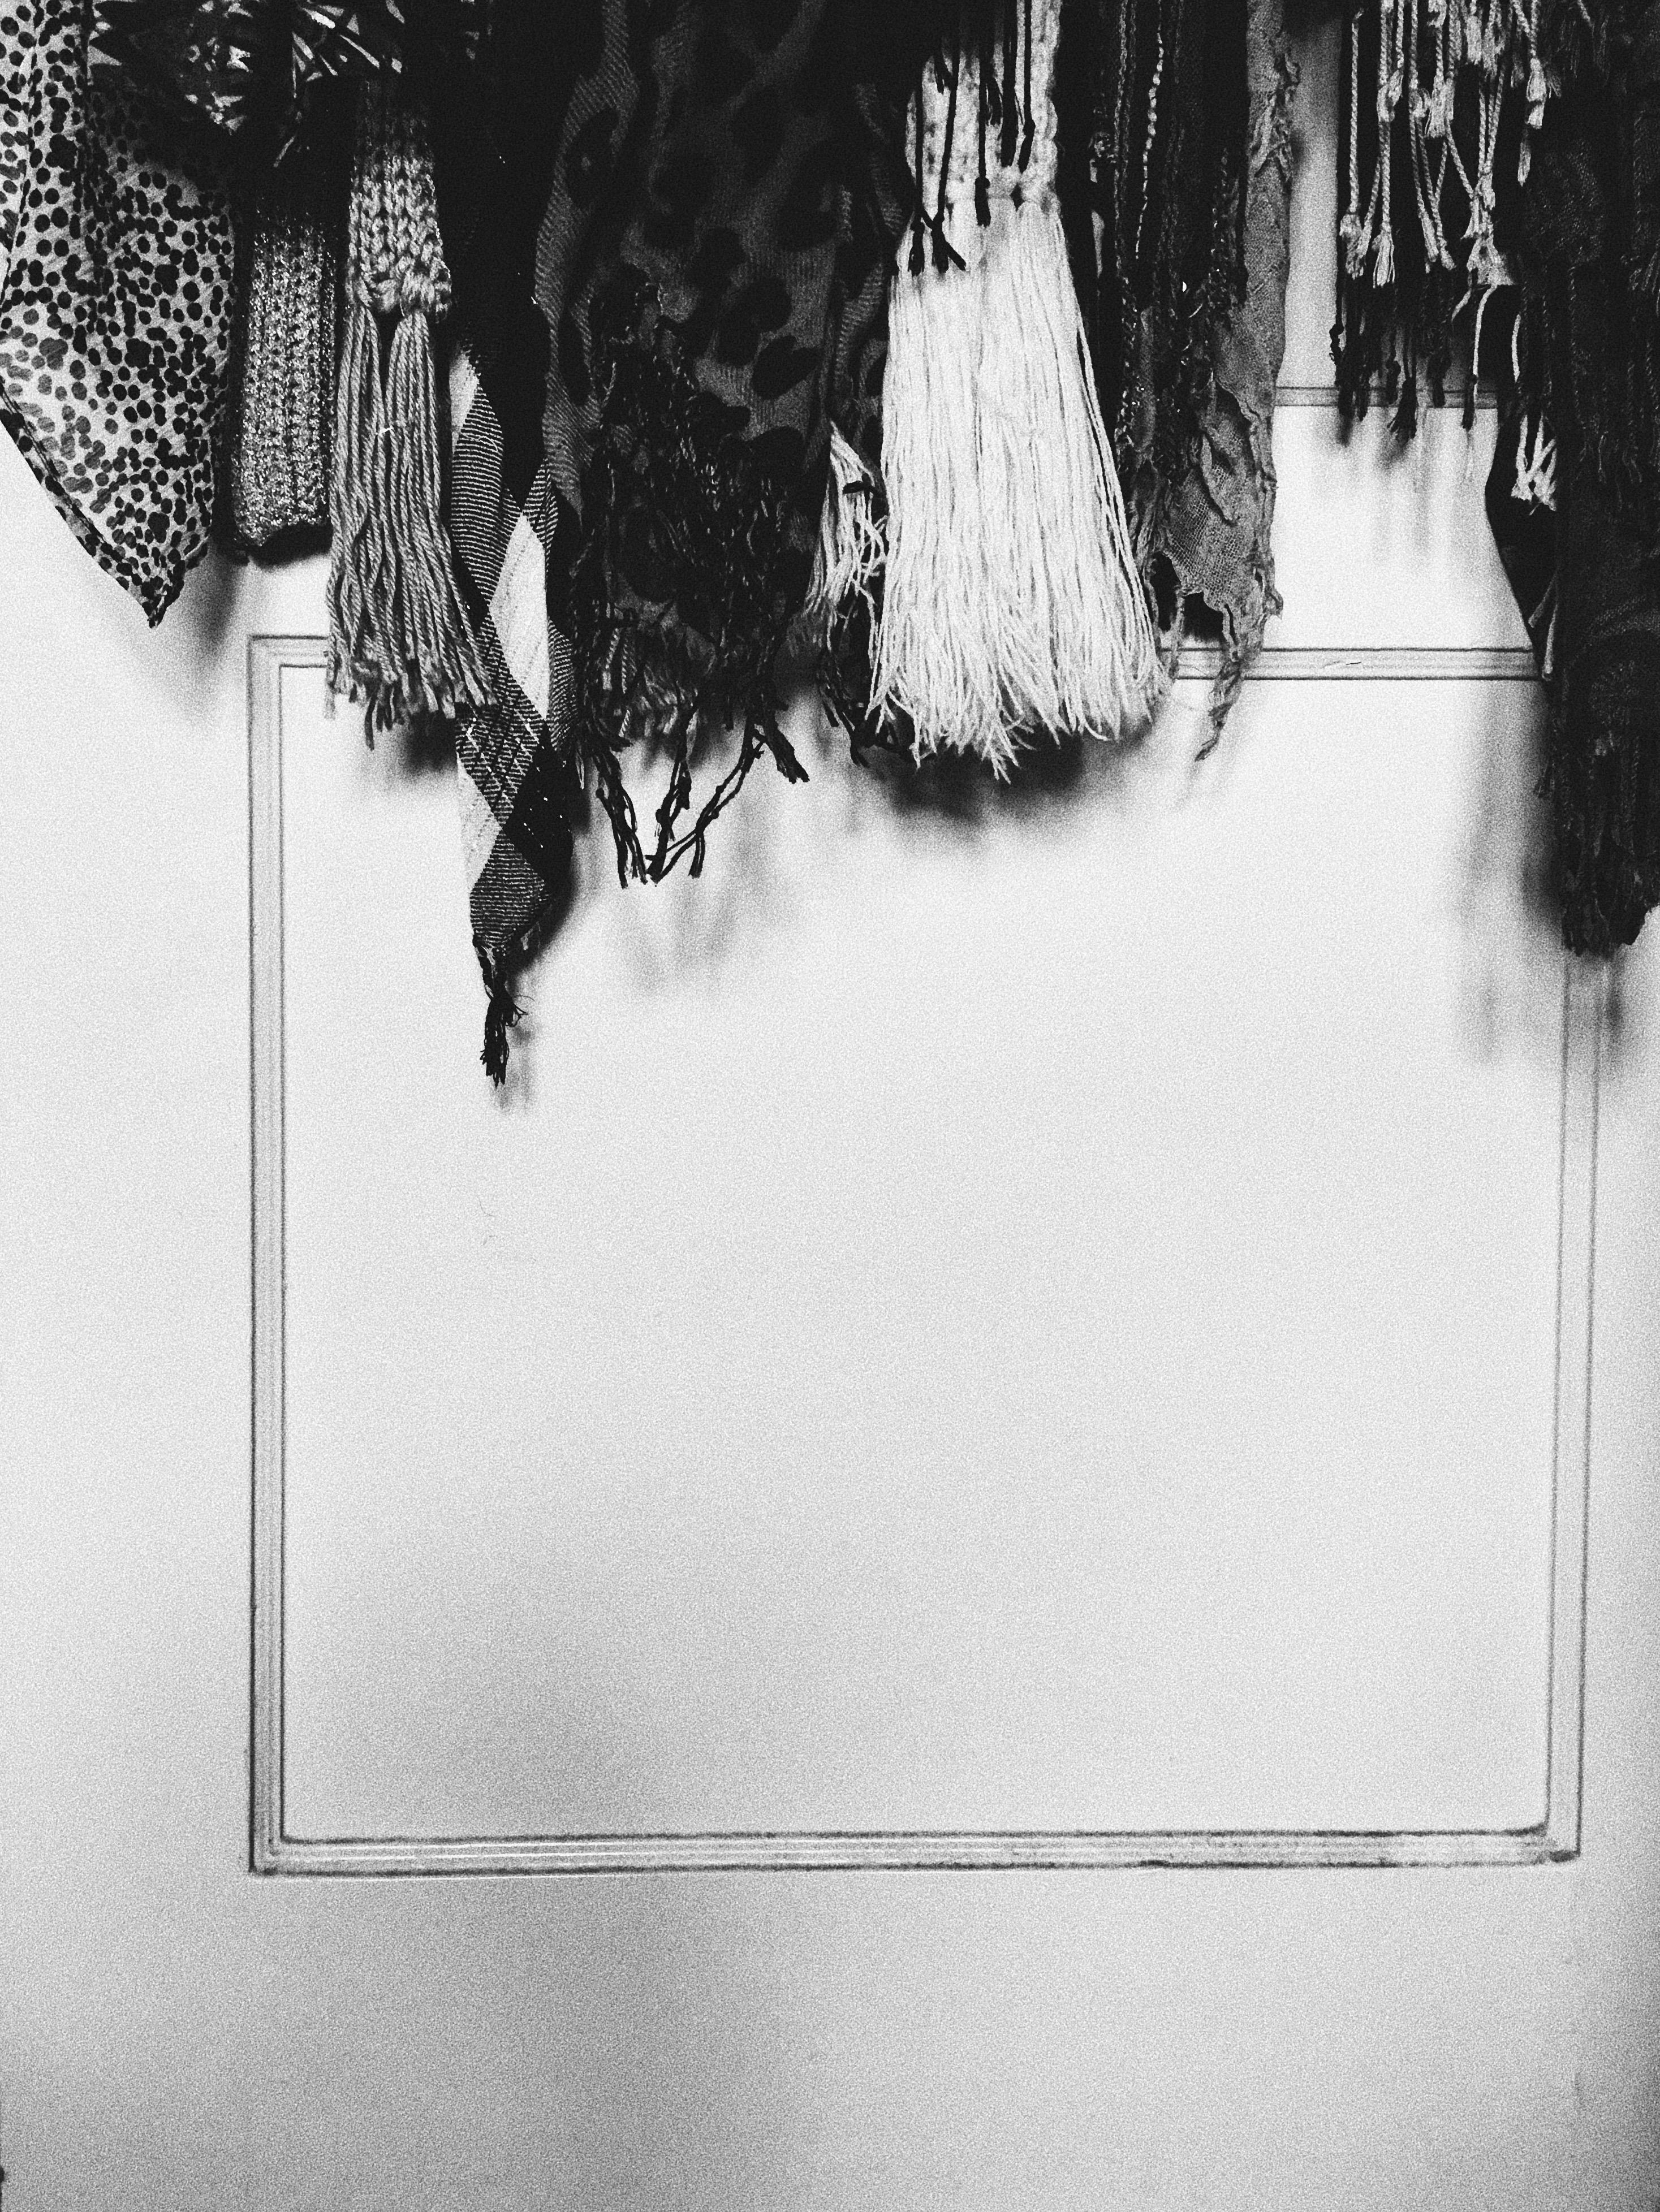 closet organization-hanging scarves-closet organizing-wear who you are